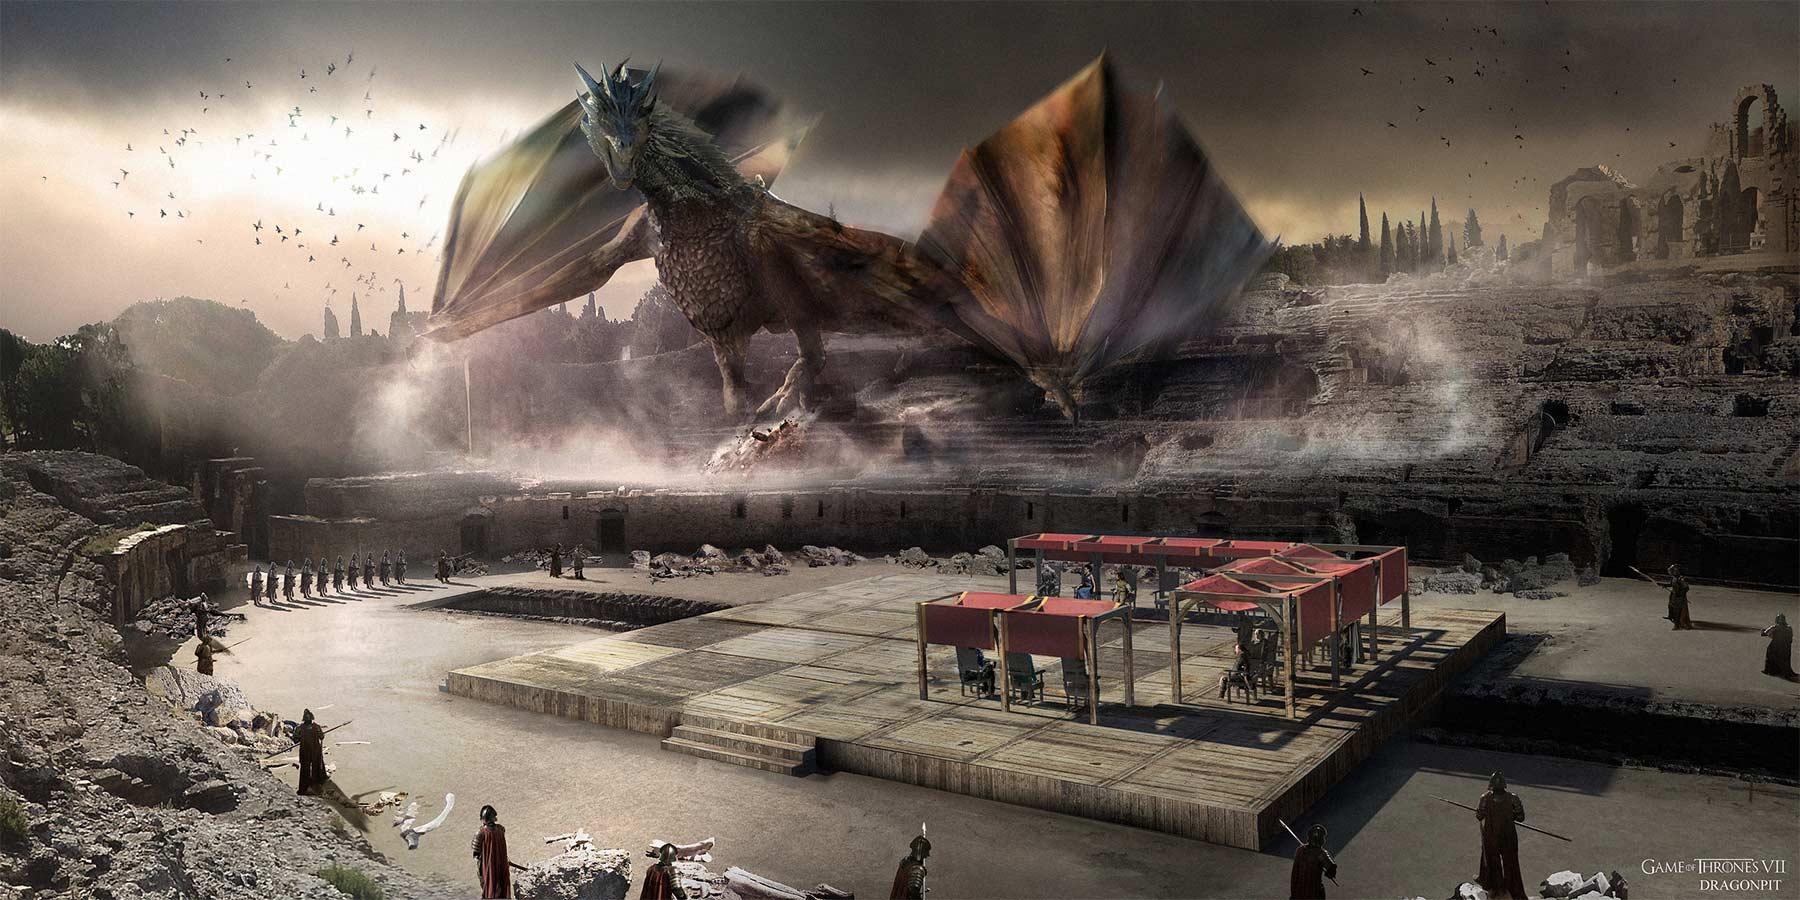 Game of Thrones Staffel 7 Concept Art Kieran-Belshaw-game-of-thrones-concept-art_10